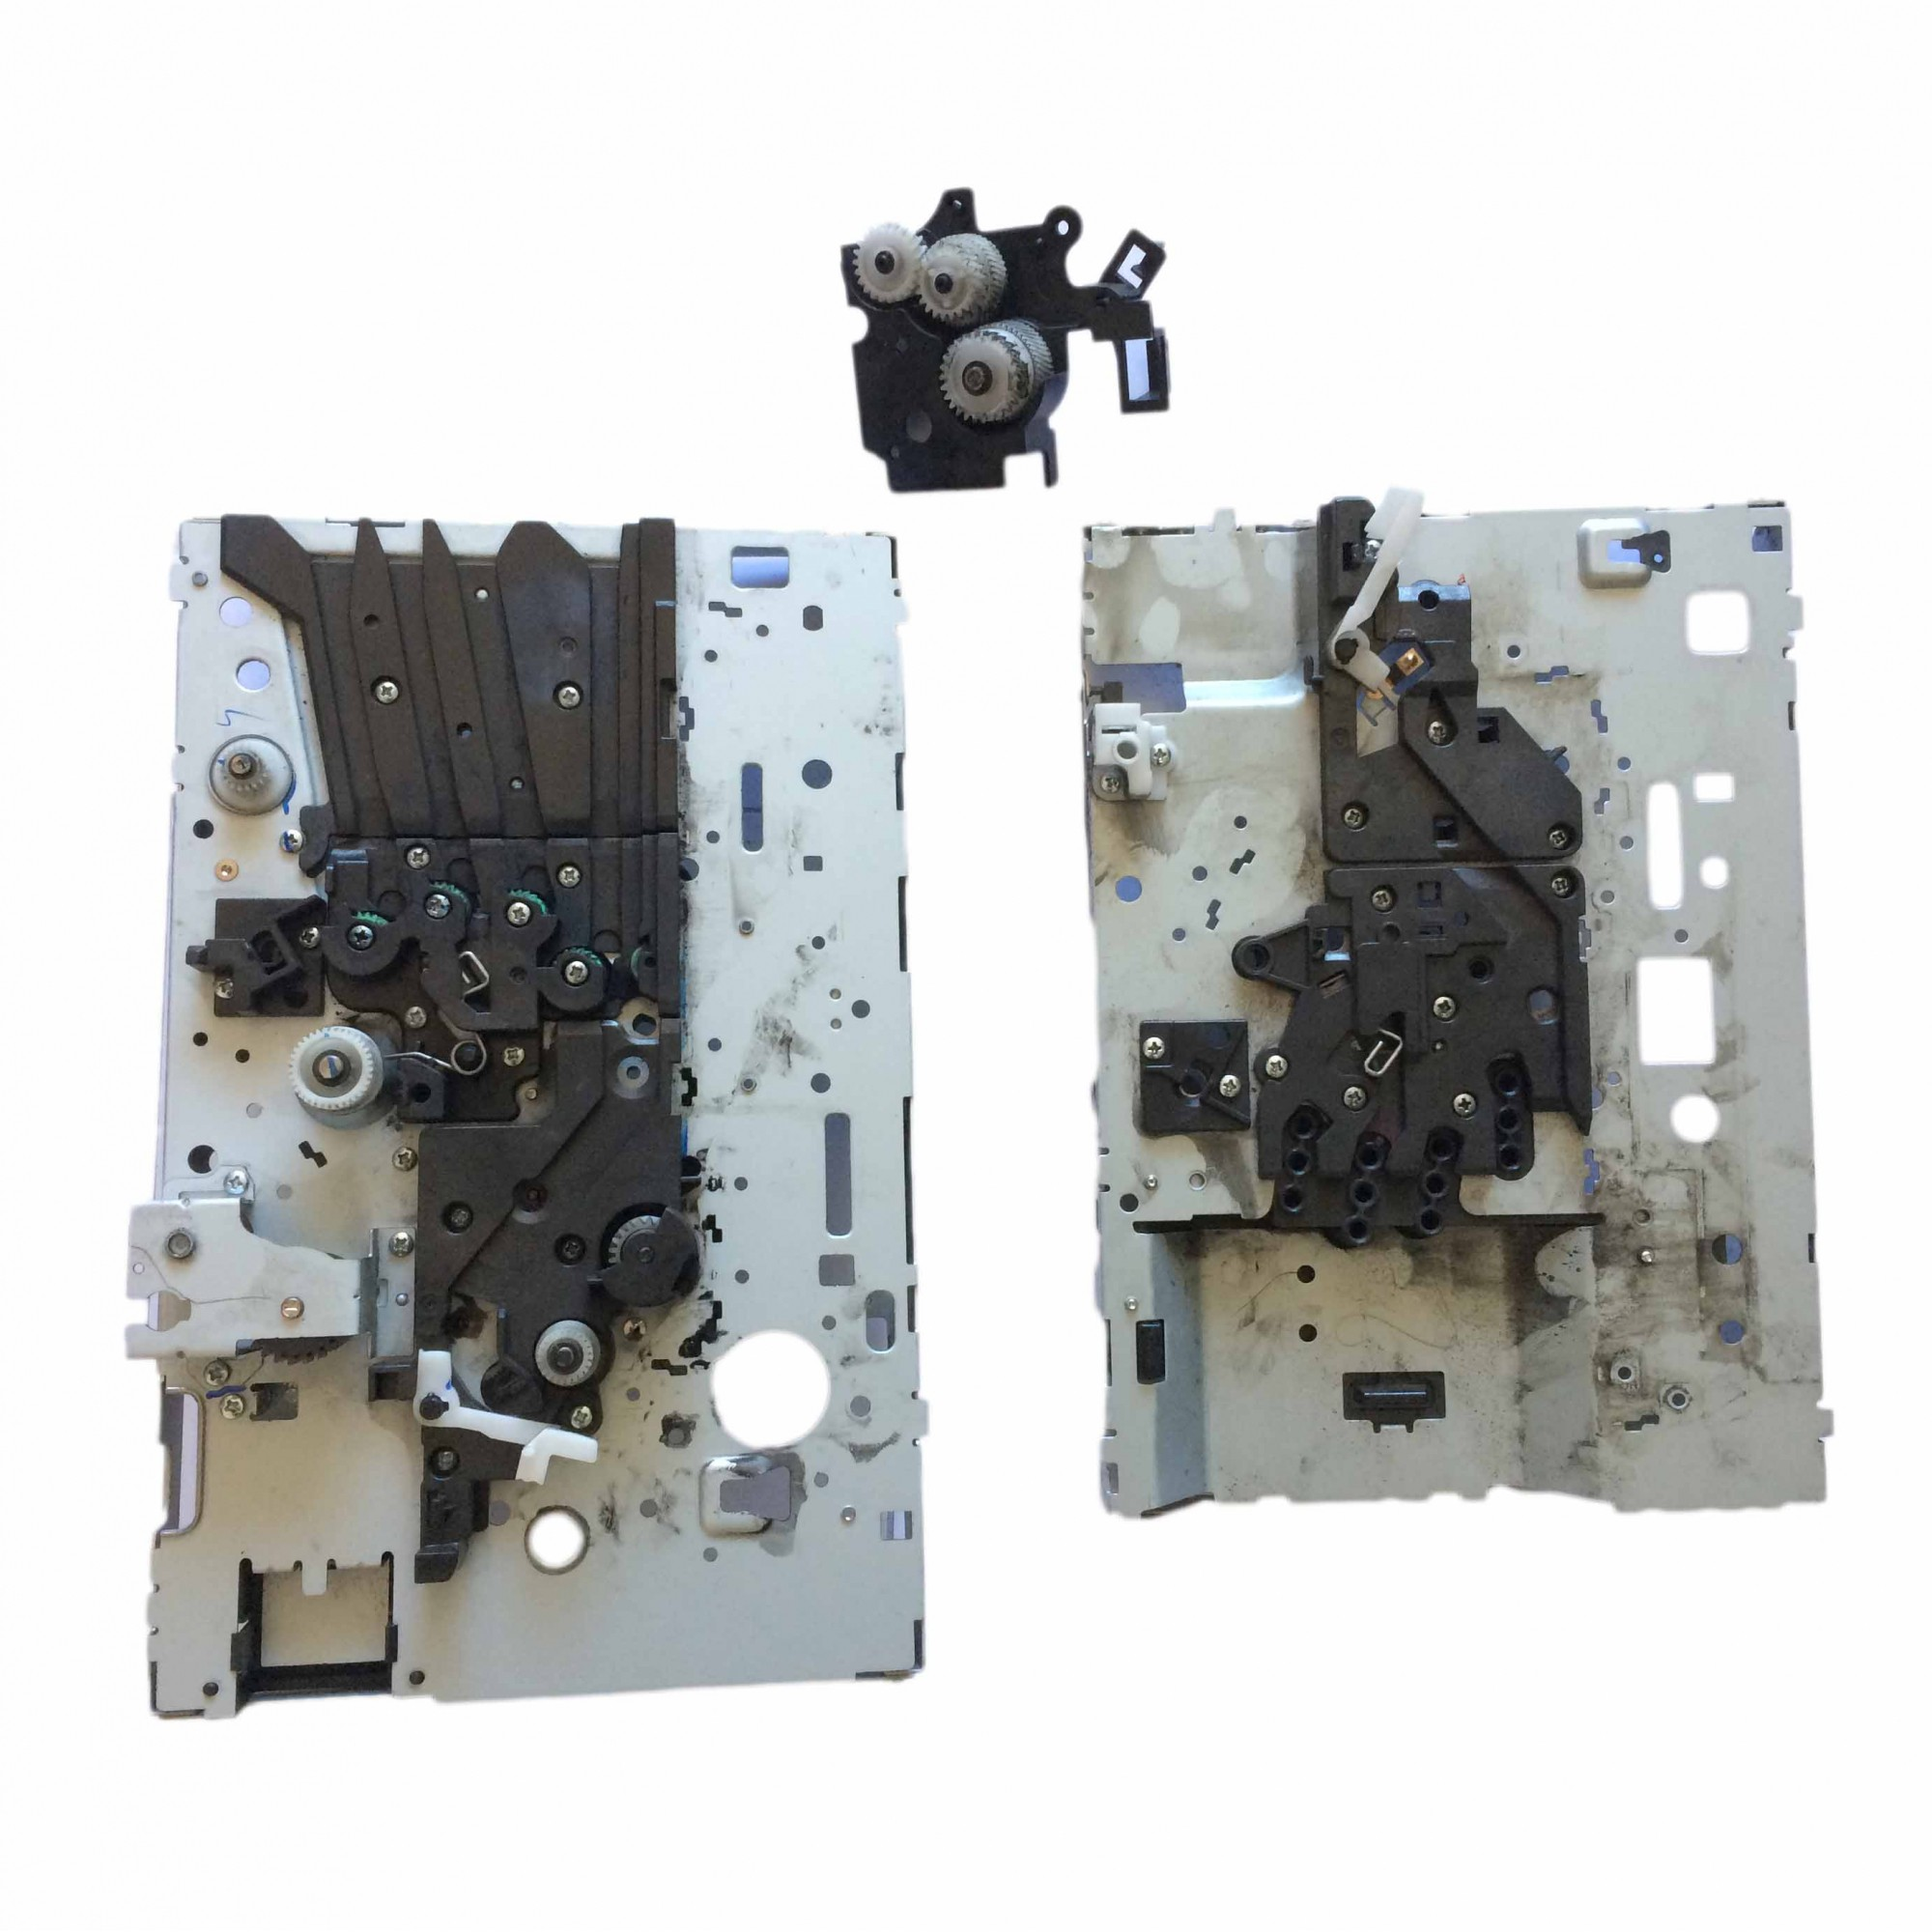 Conjunto de engrenagens Mecanismo Completo Multifuncional Samsung Sl-c410w C460w C460fw PN:j561-05695.a#2 - Retirado